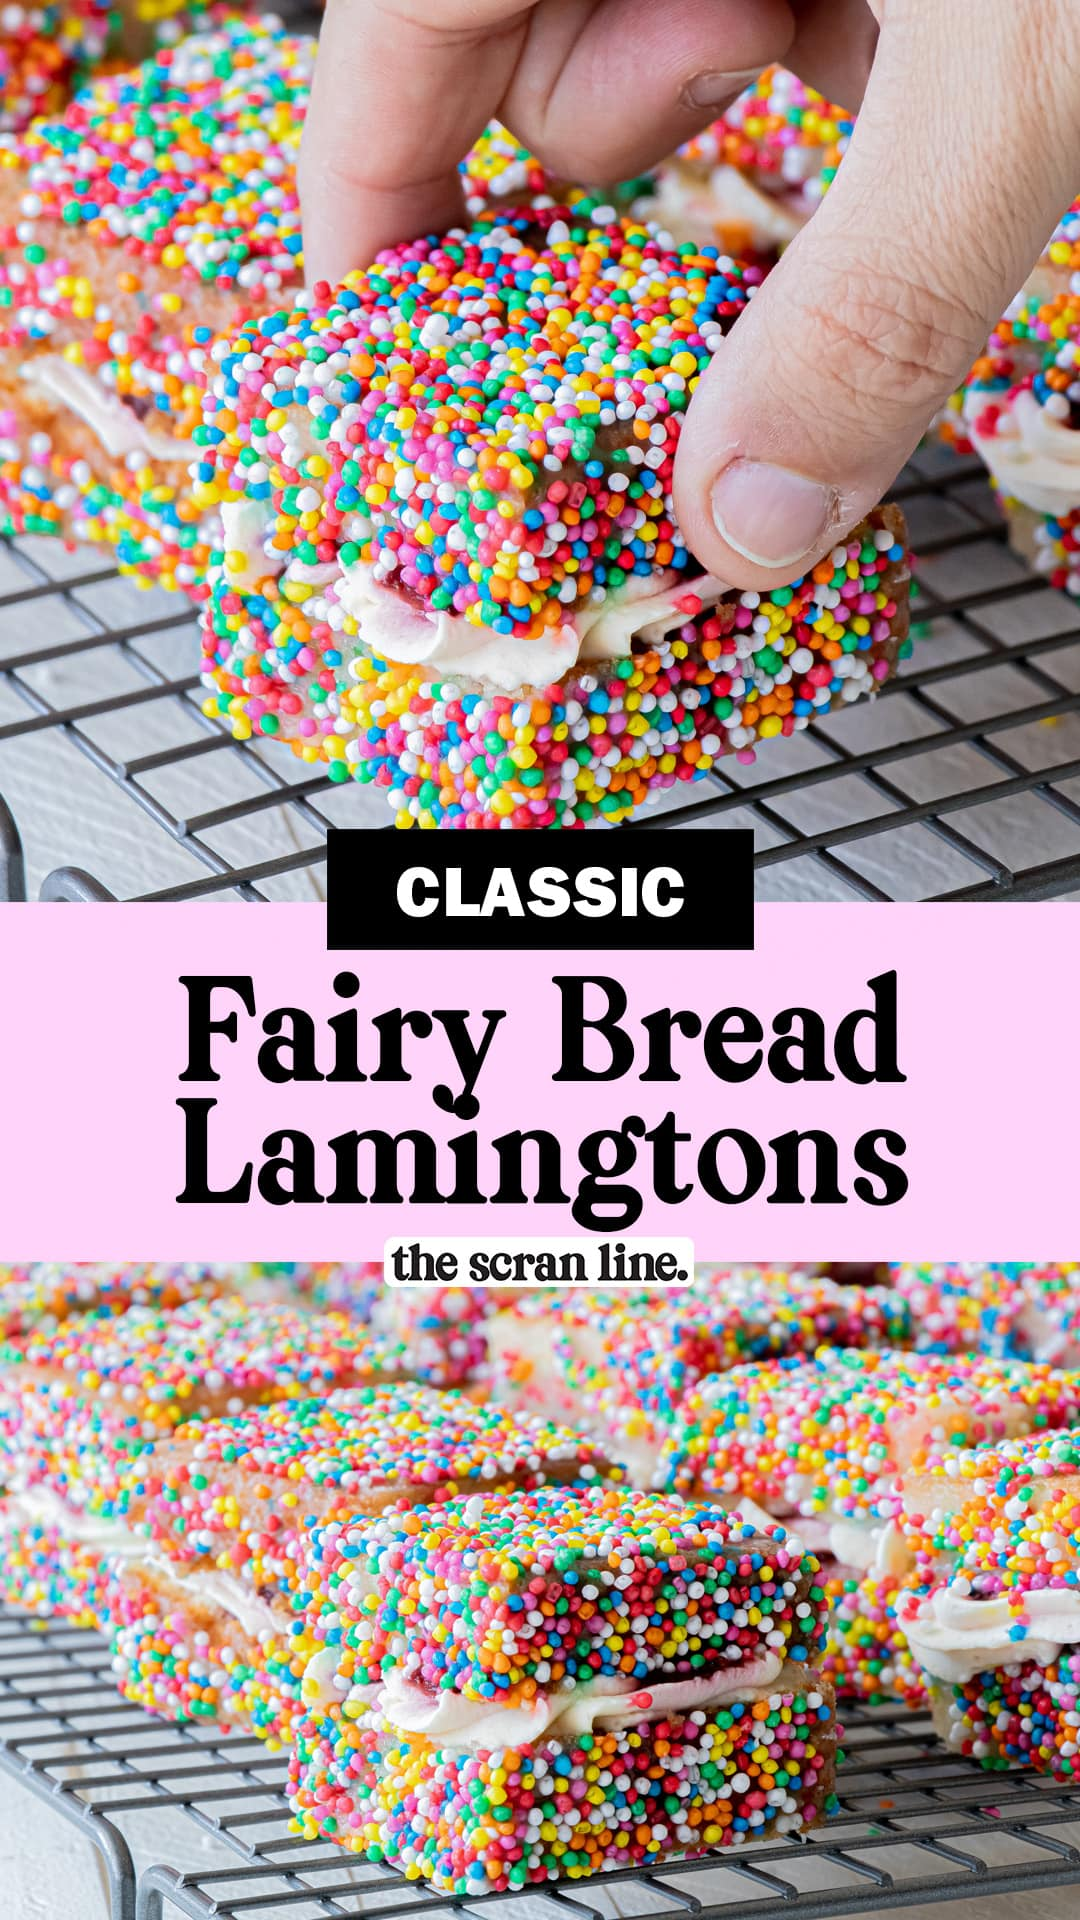 Pinterest image for Fairy Bread Lamingtons